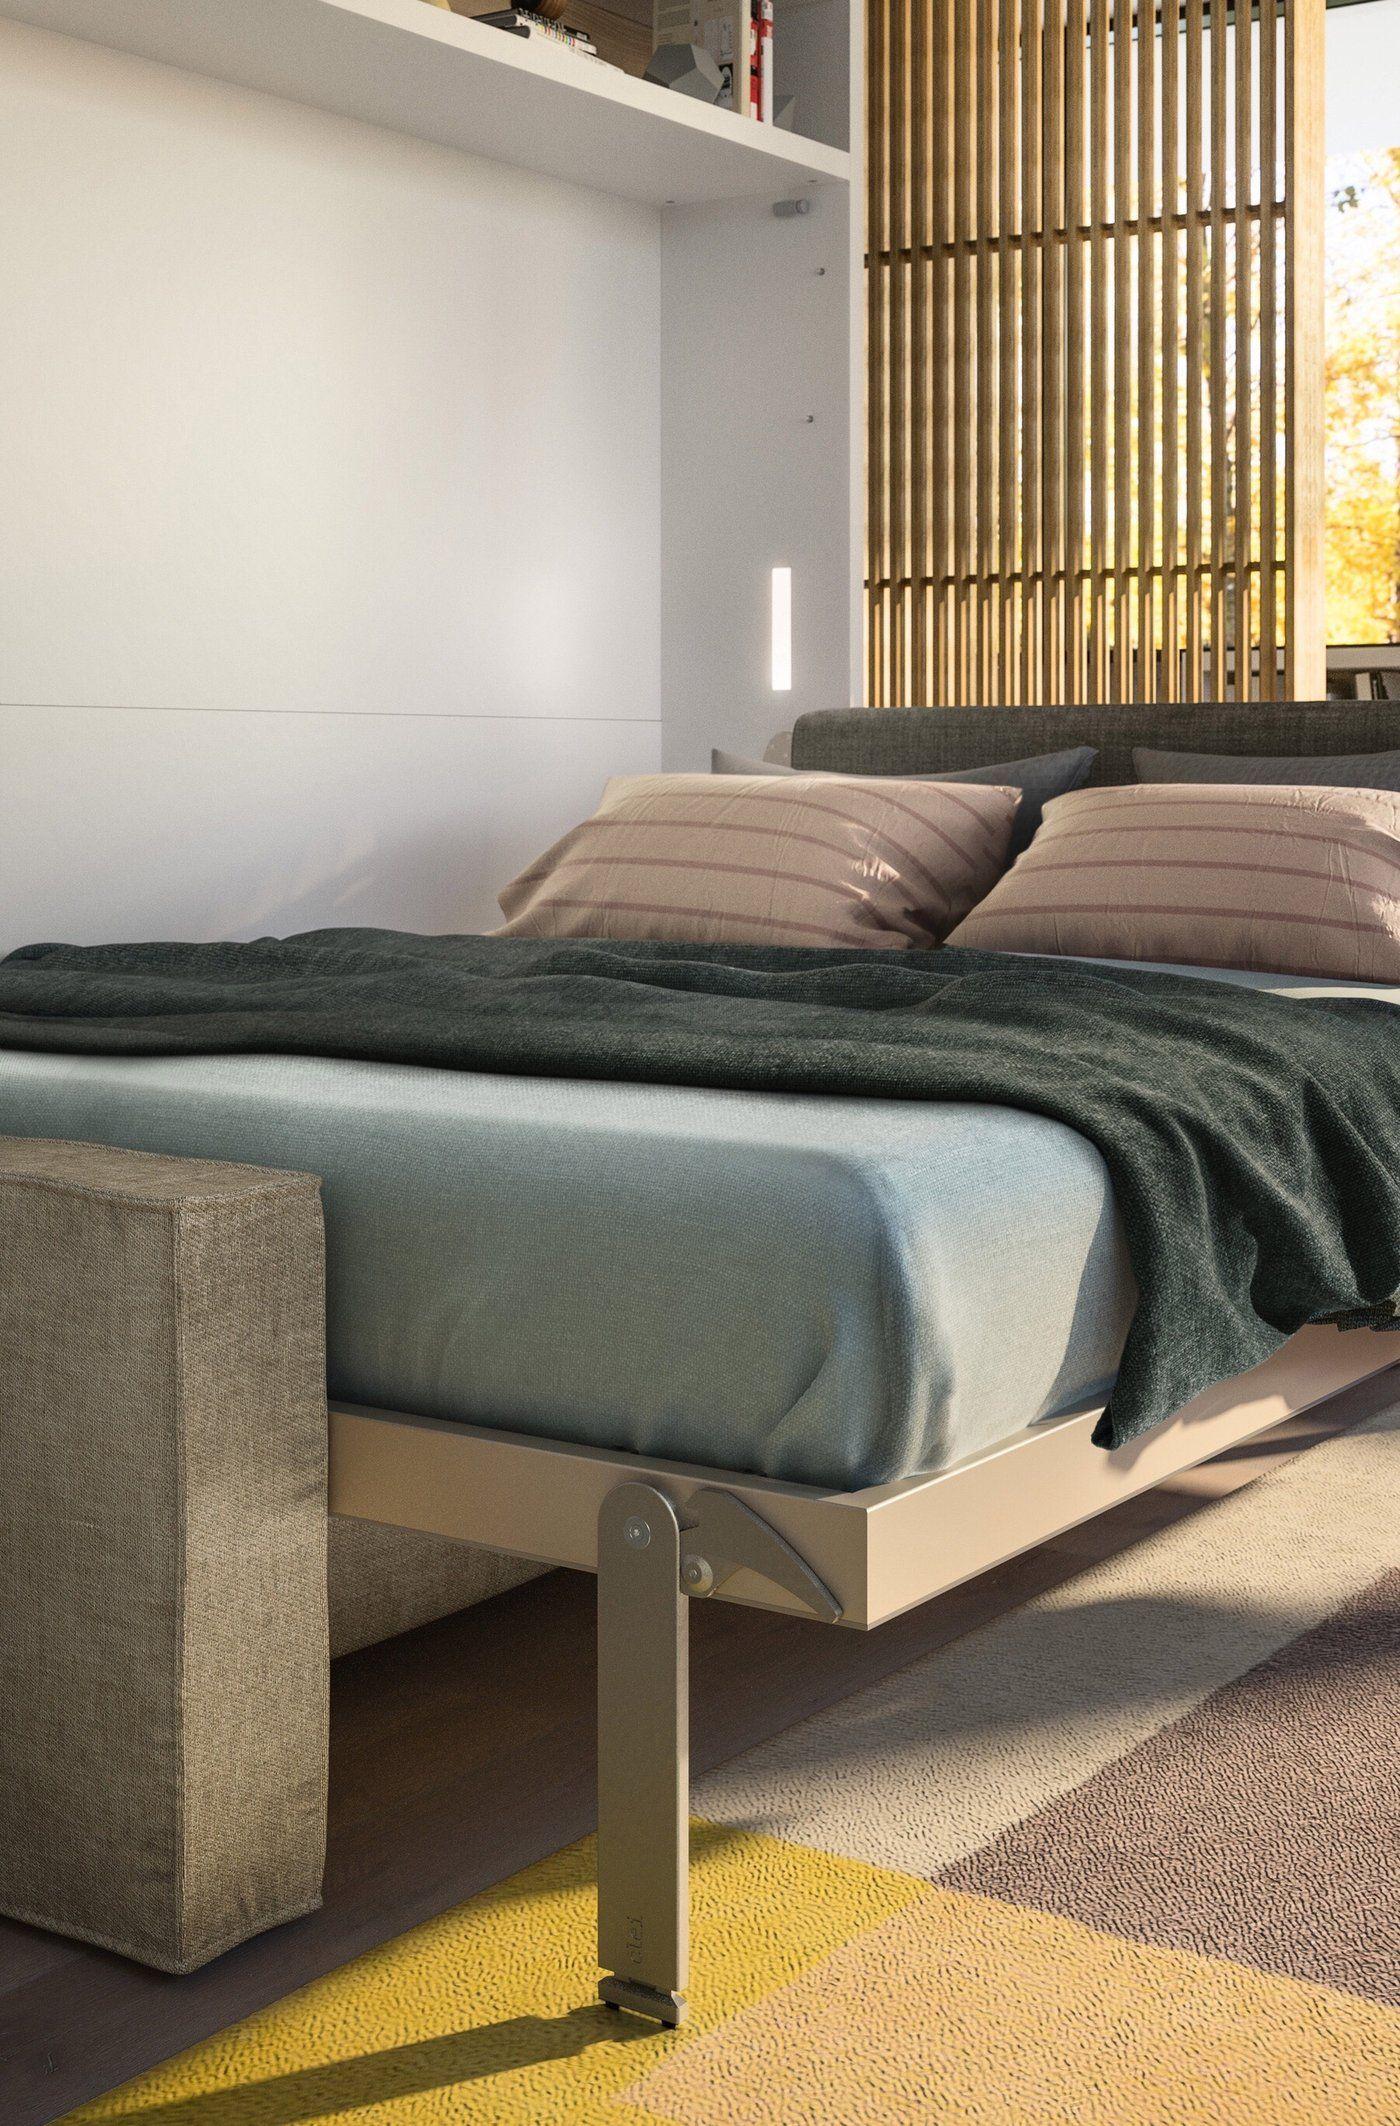 Circe Sofa in 2020 Space saving beds, Resource furniture